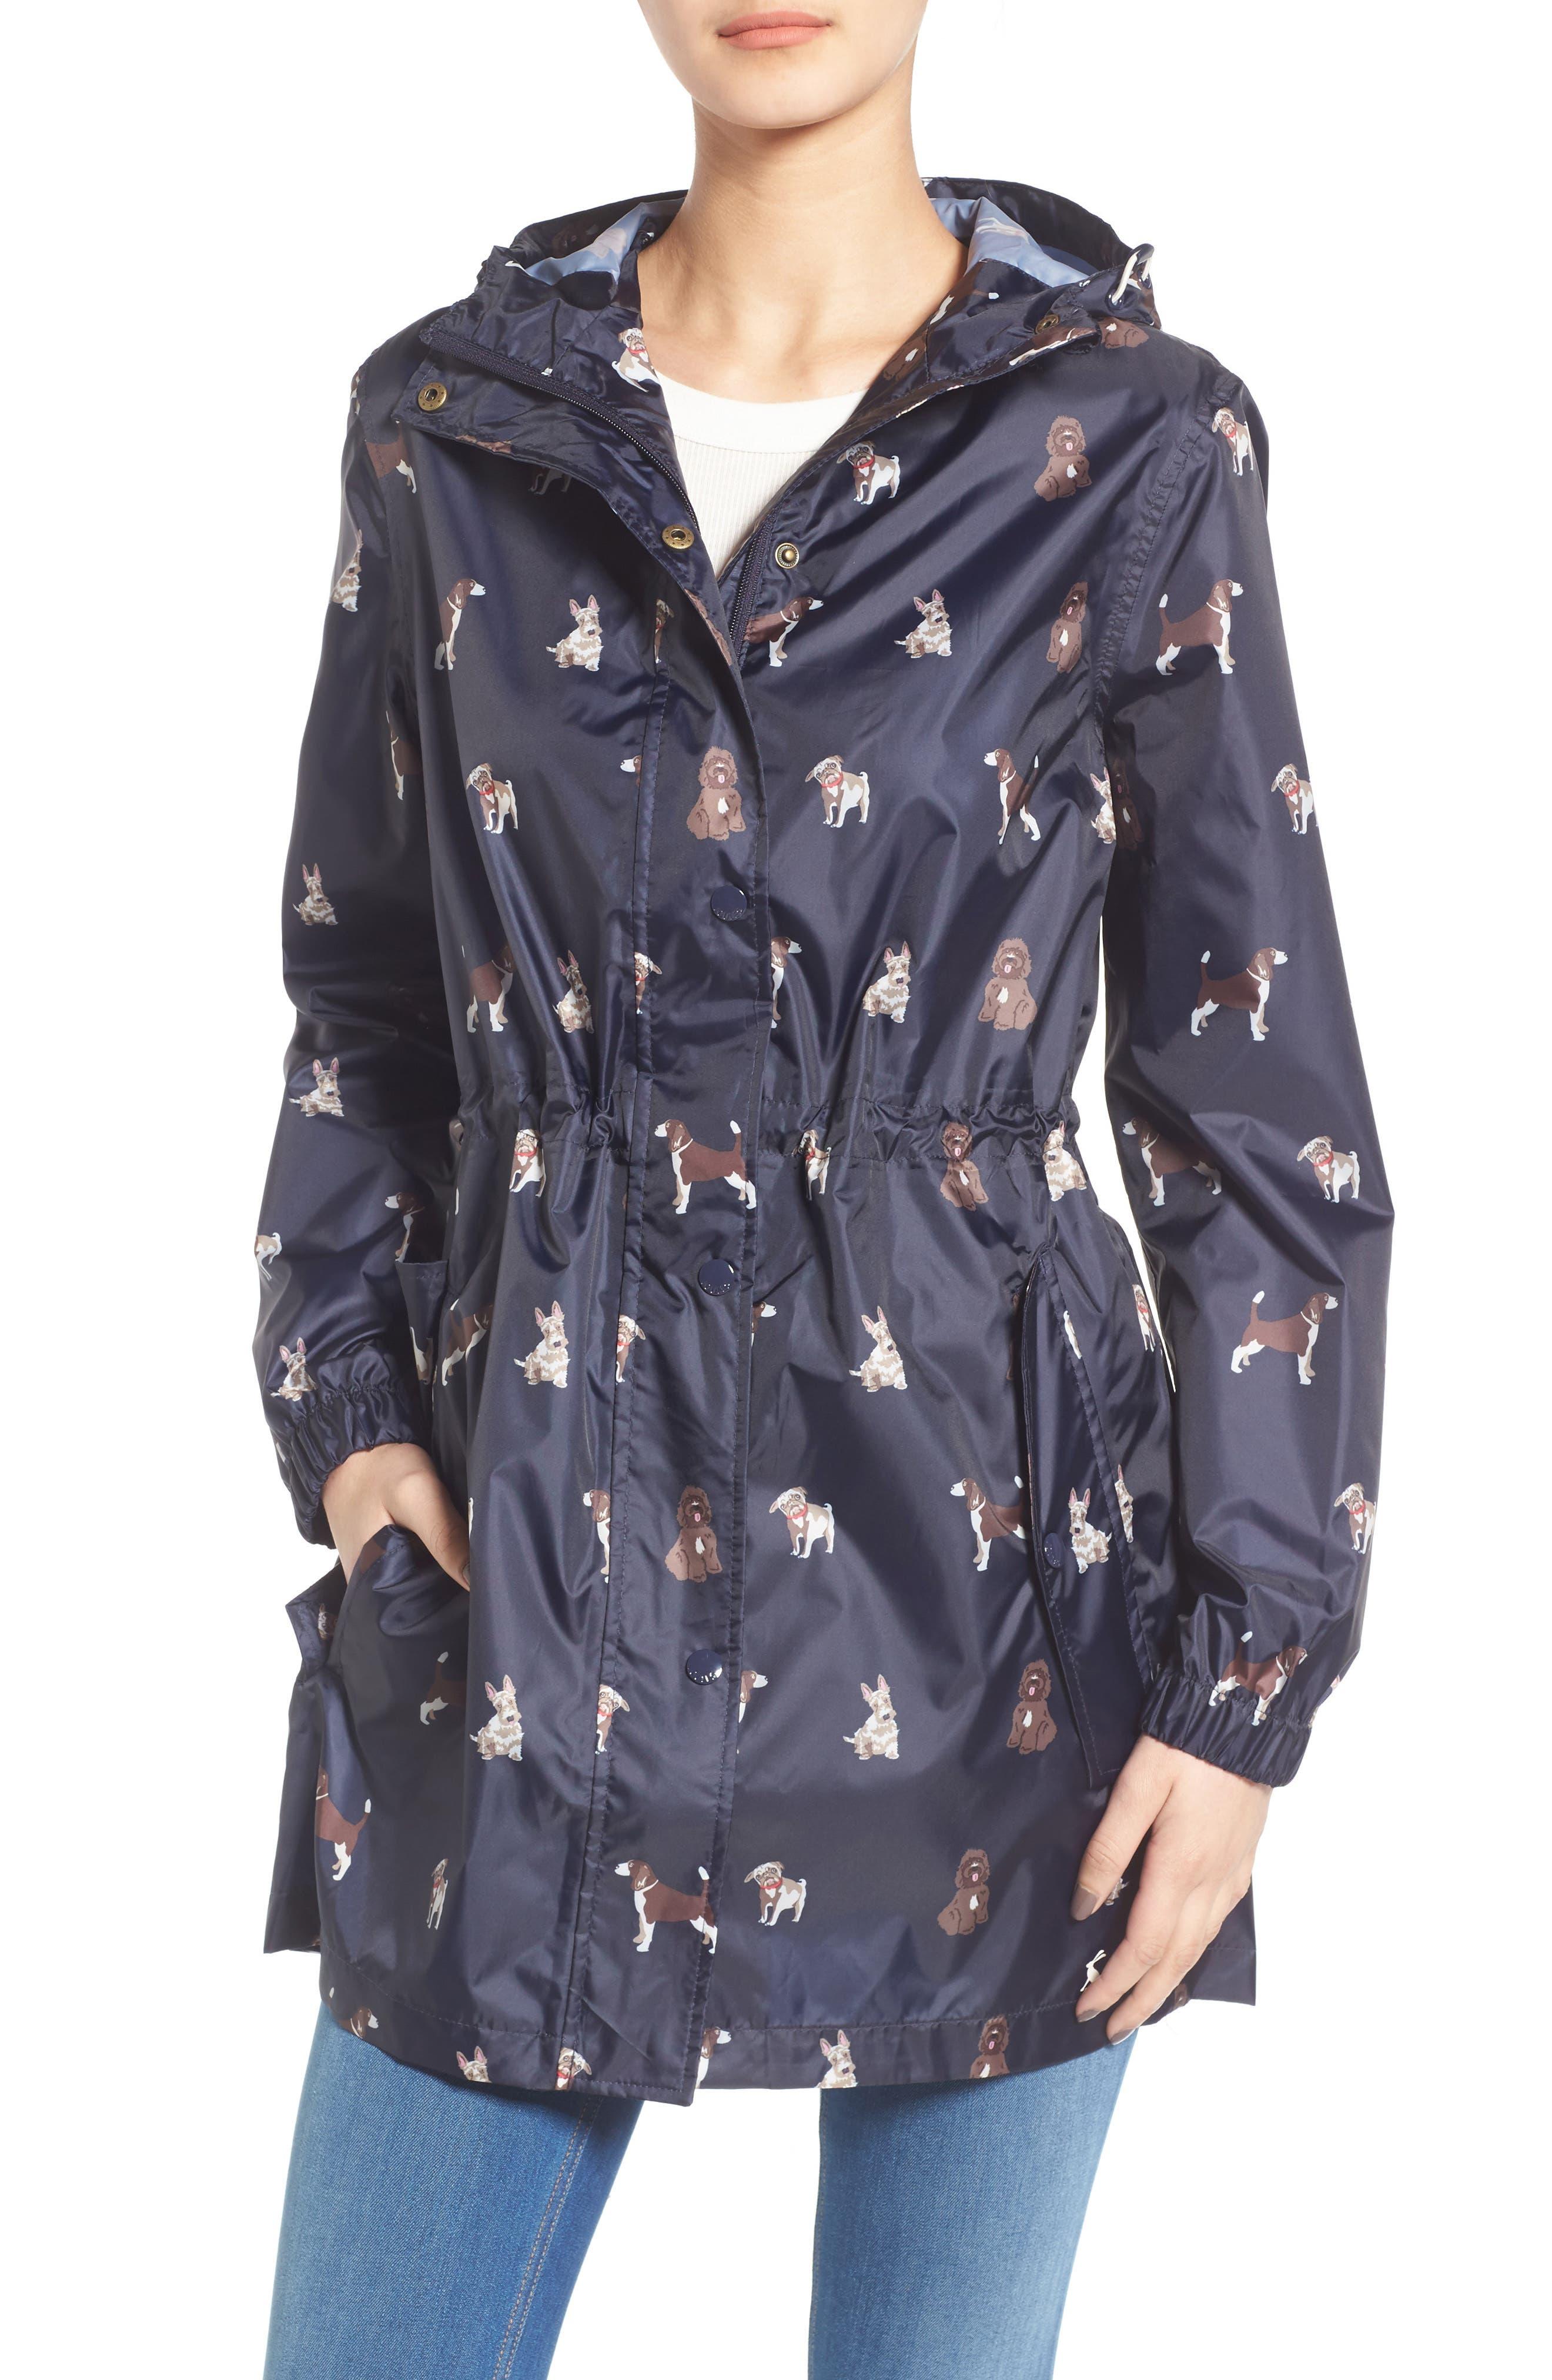 Alternate Image 1 Selected - Joules Right as Rain Packable Print Hooded Raincoat